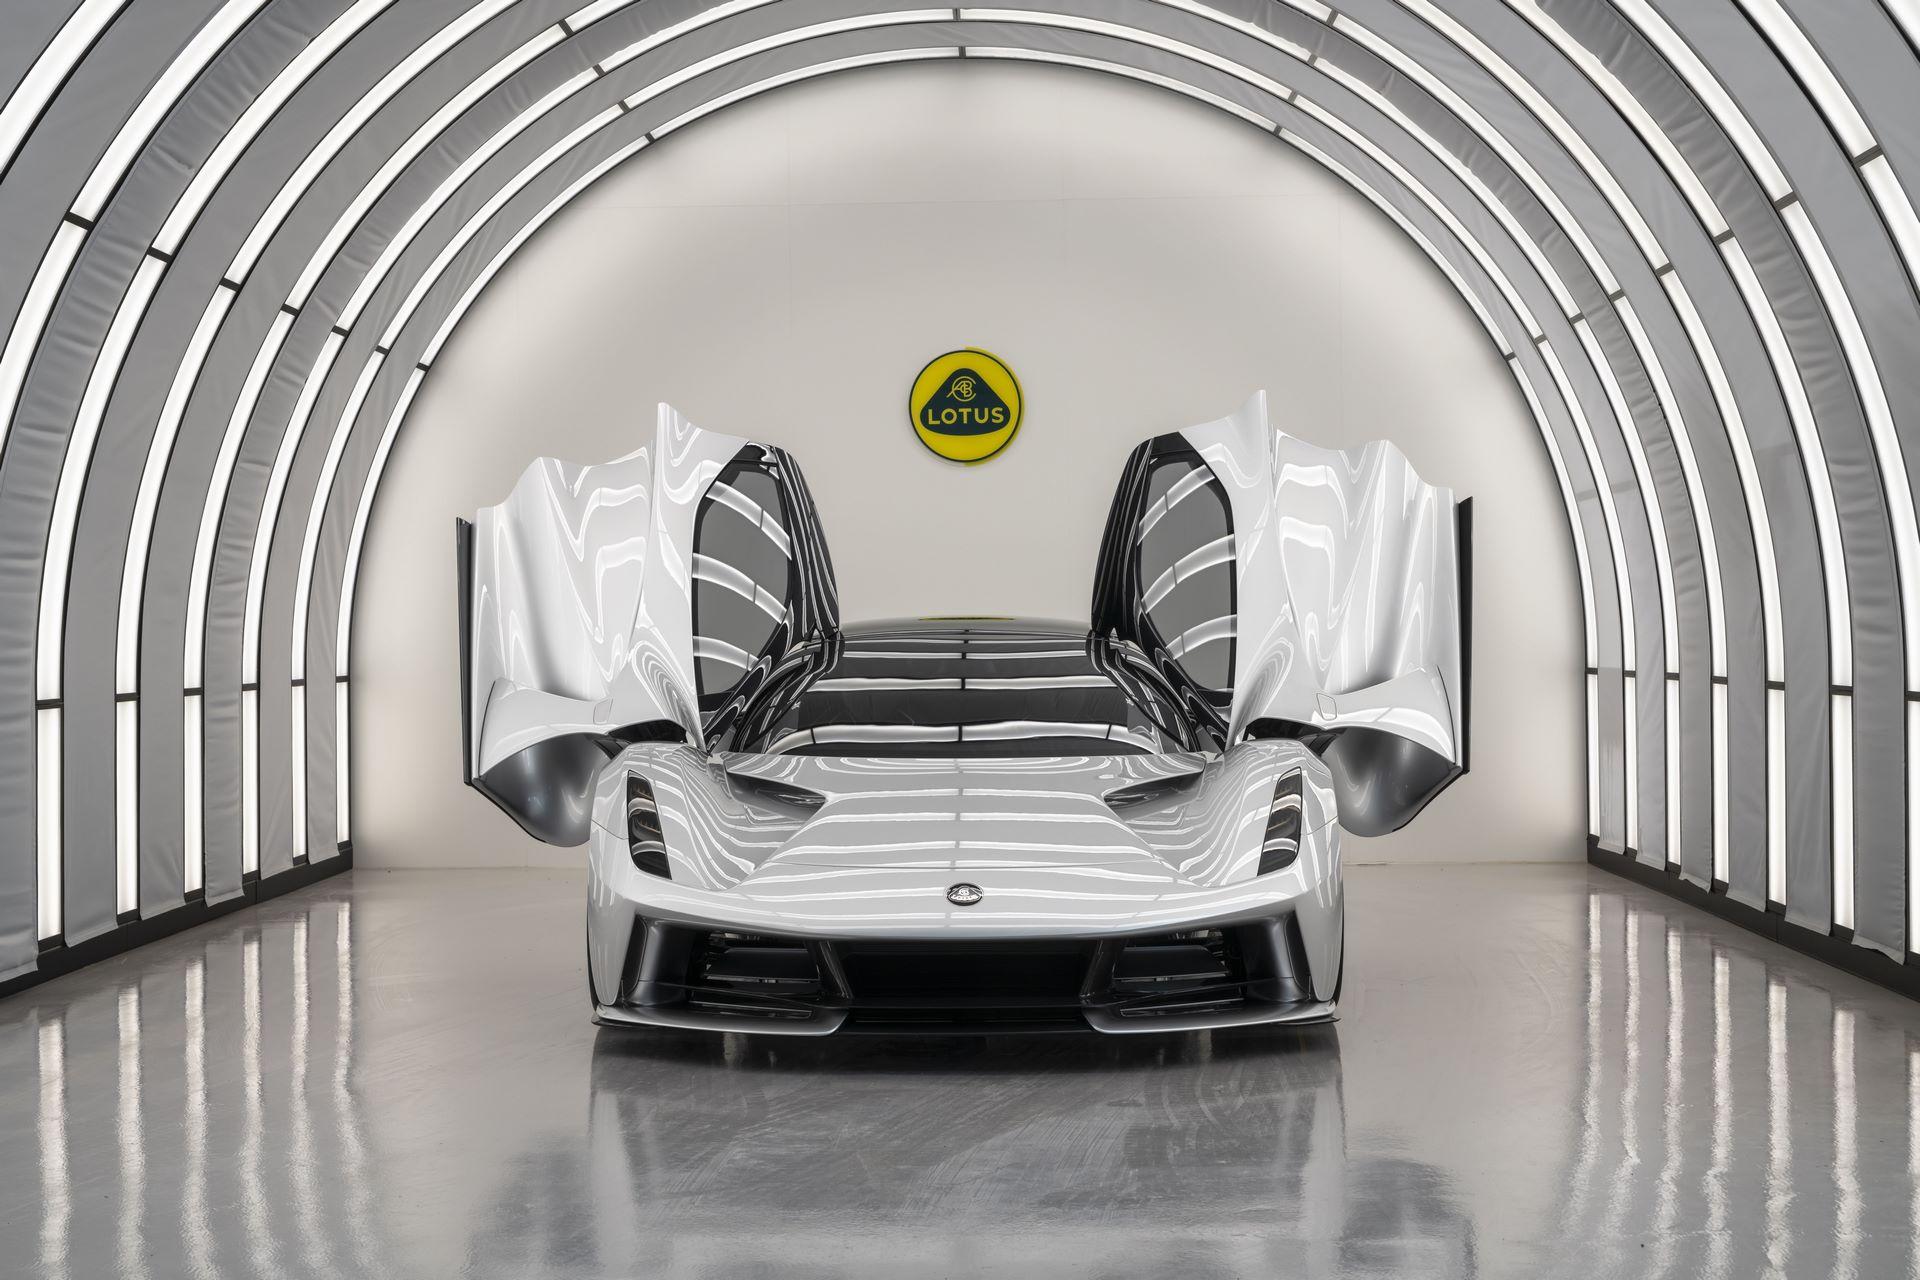 Lotus-Evija-Assembly-Hall_plant-factory-7